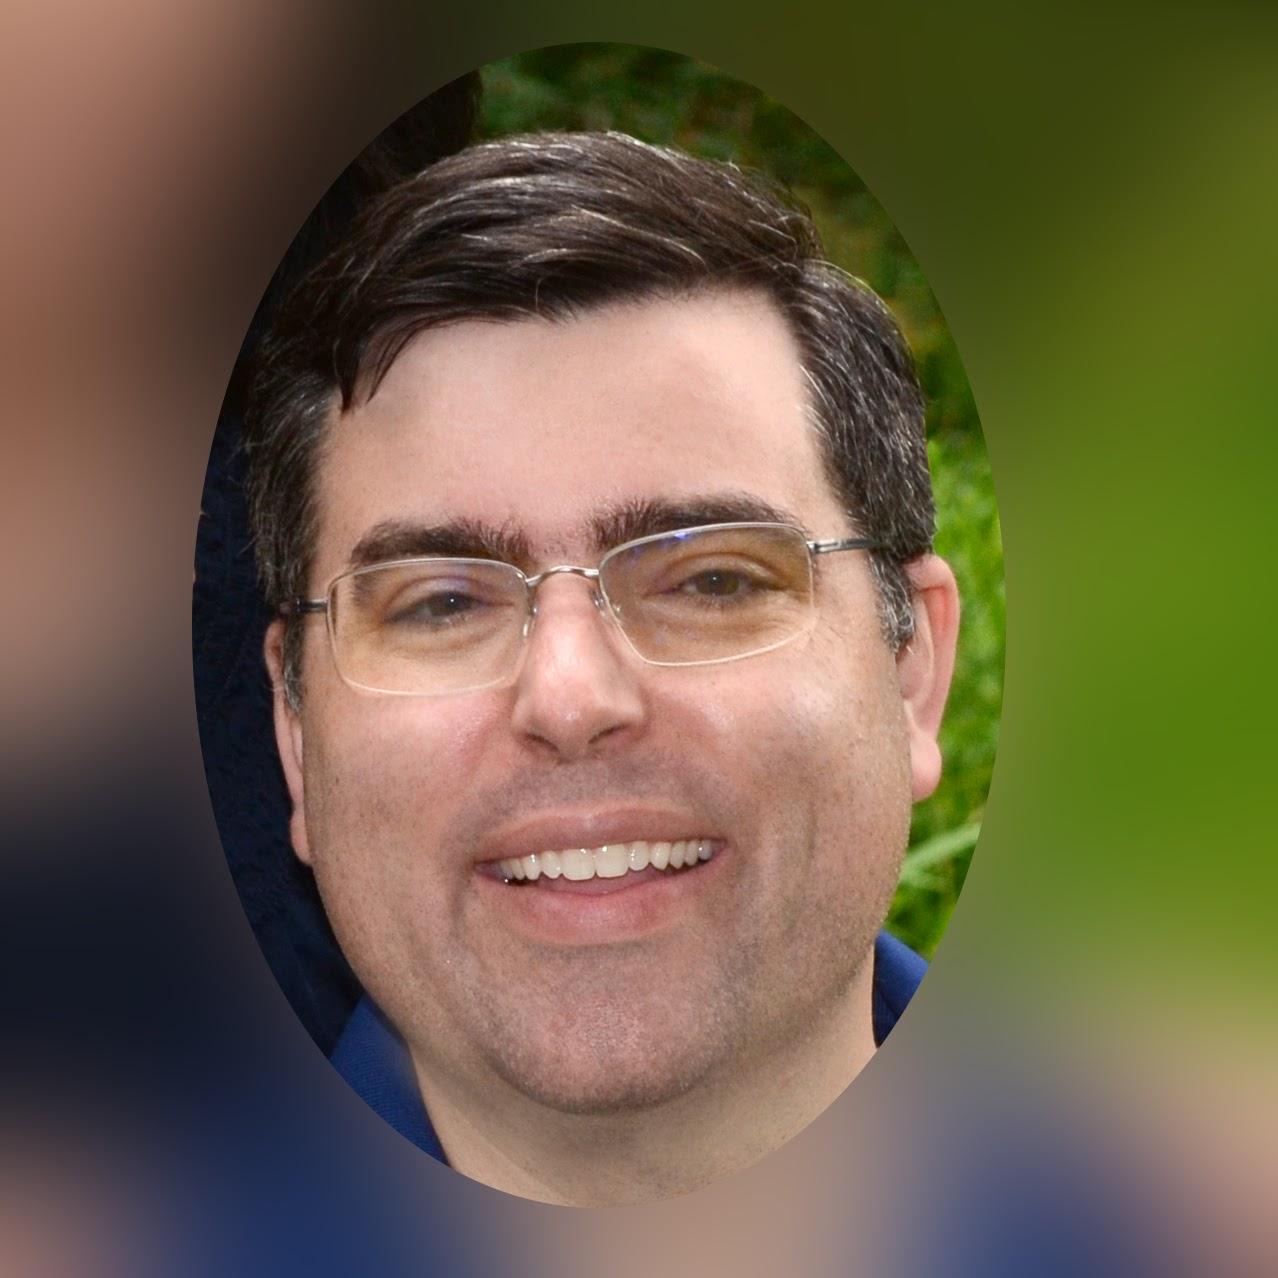 Michael Waddell - Senior Software Architect, Director of Information TechnologyBio...